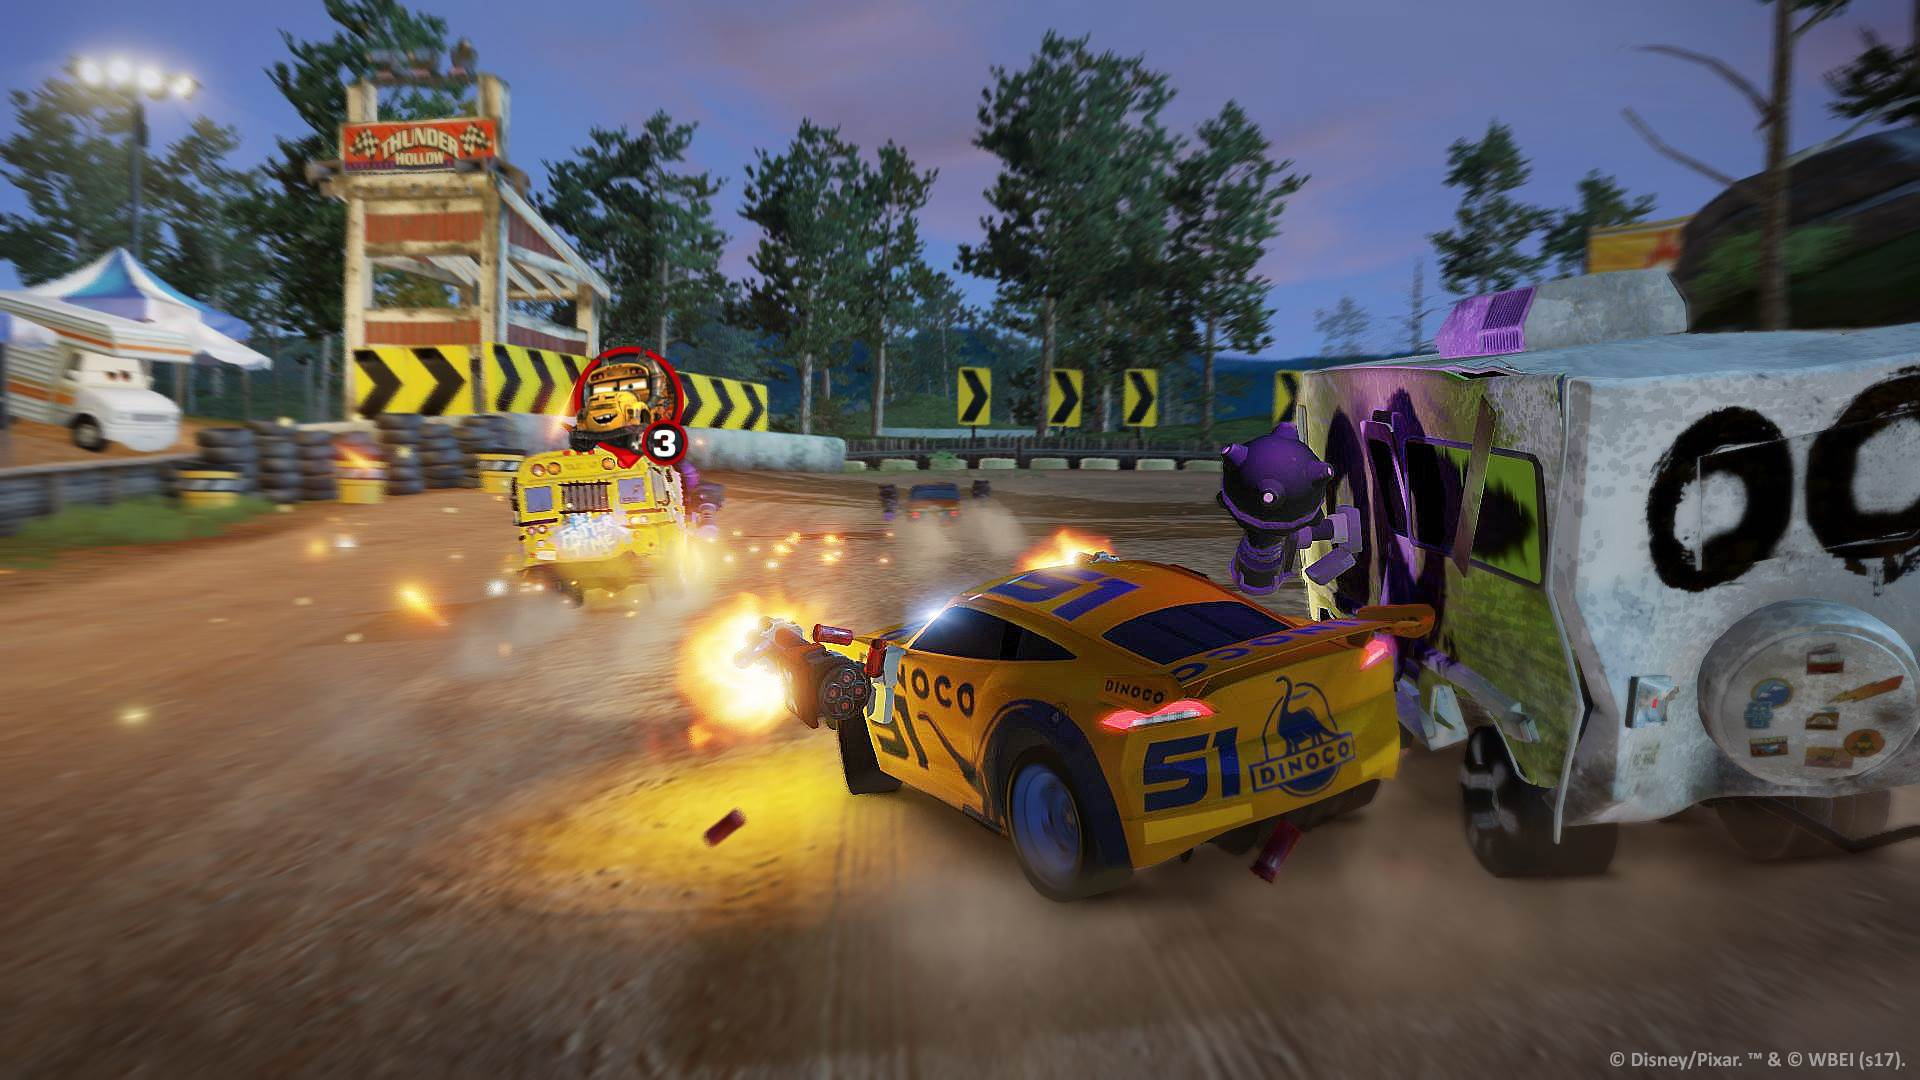 Cars 3 preview - Boss_Fritter4_01_Diesta_C